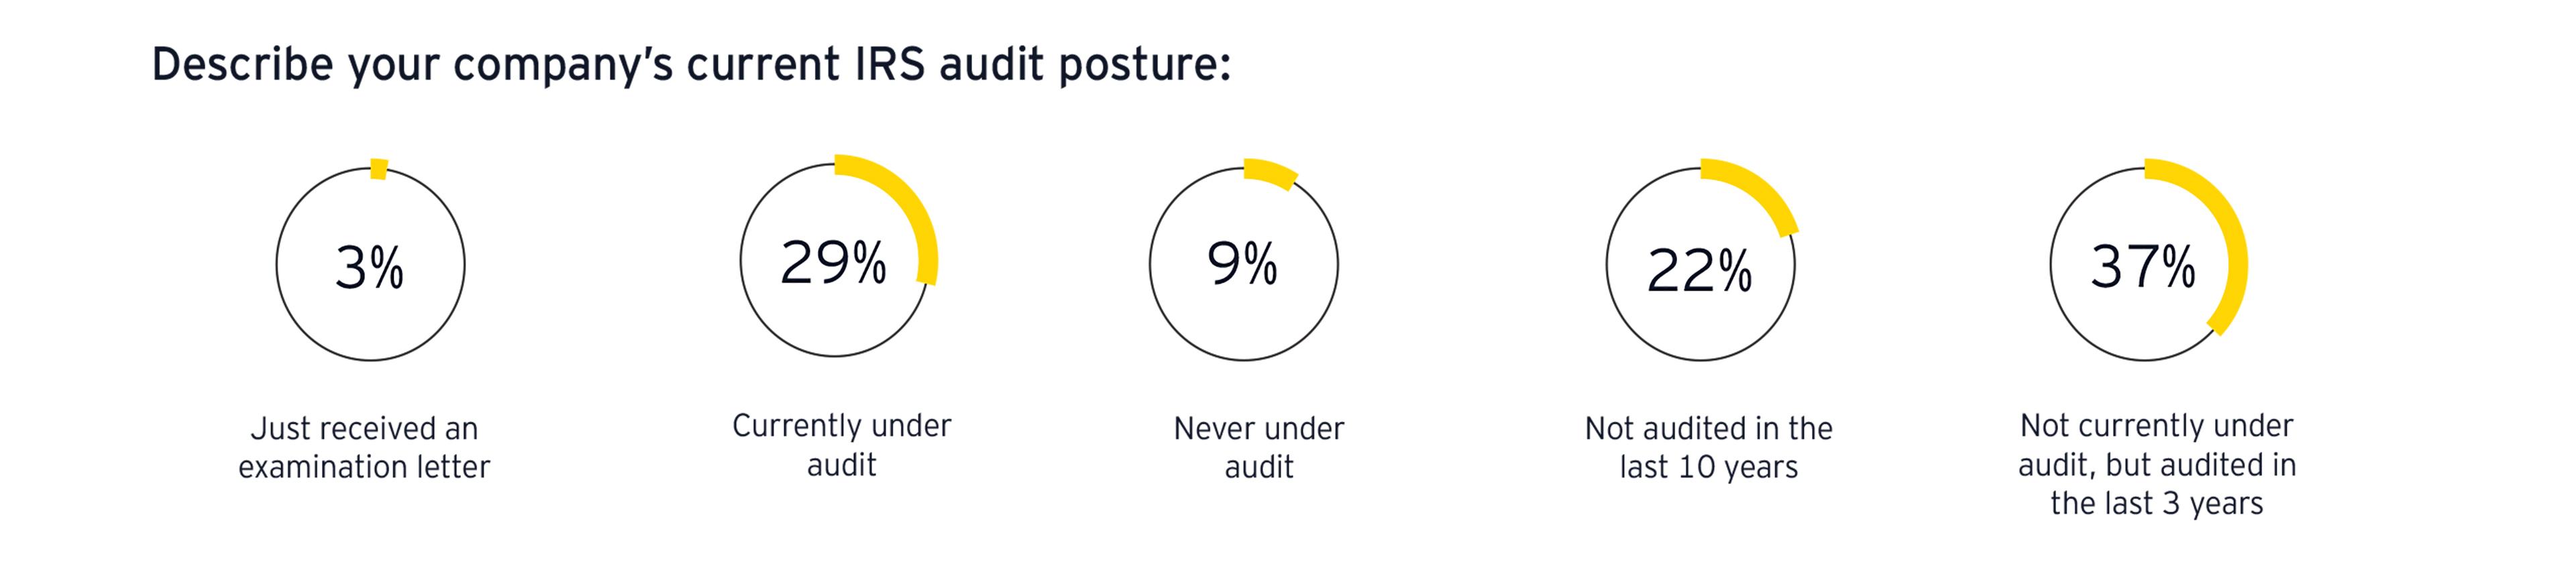 ey-current-irs-audit-posture-4